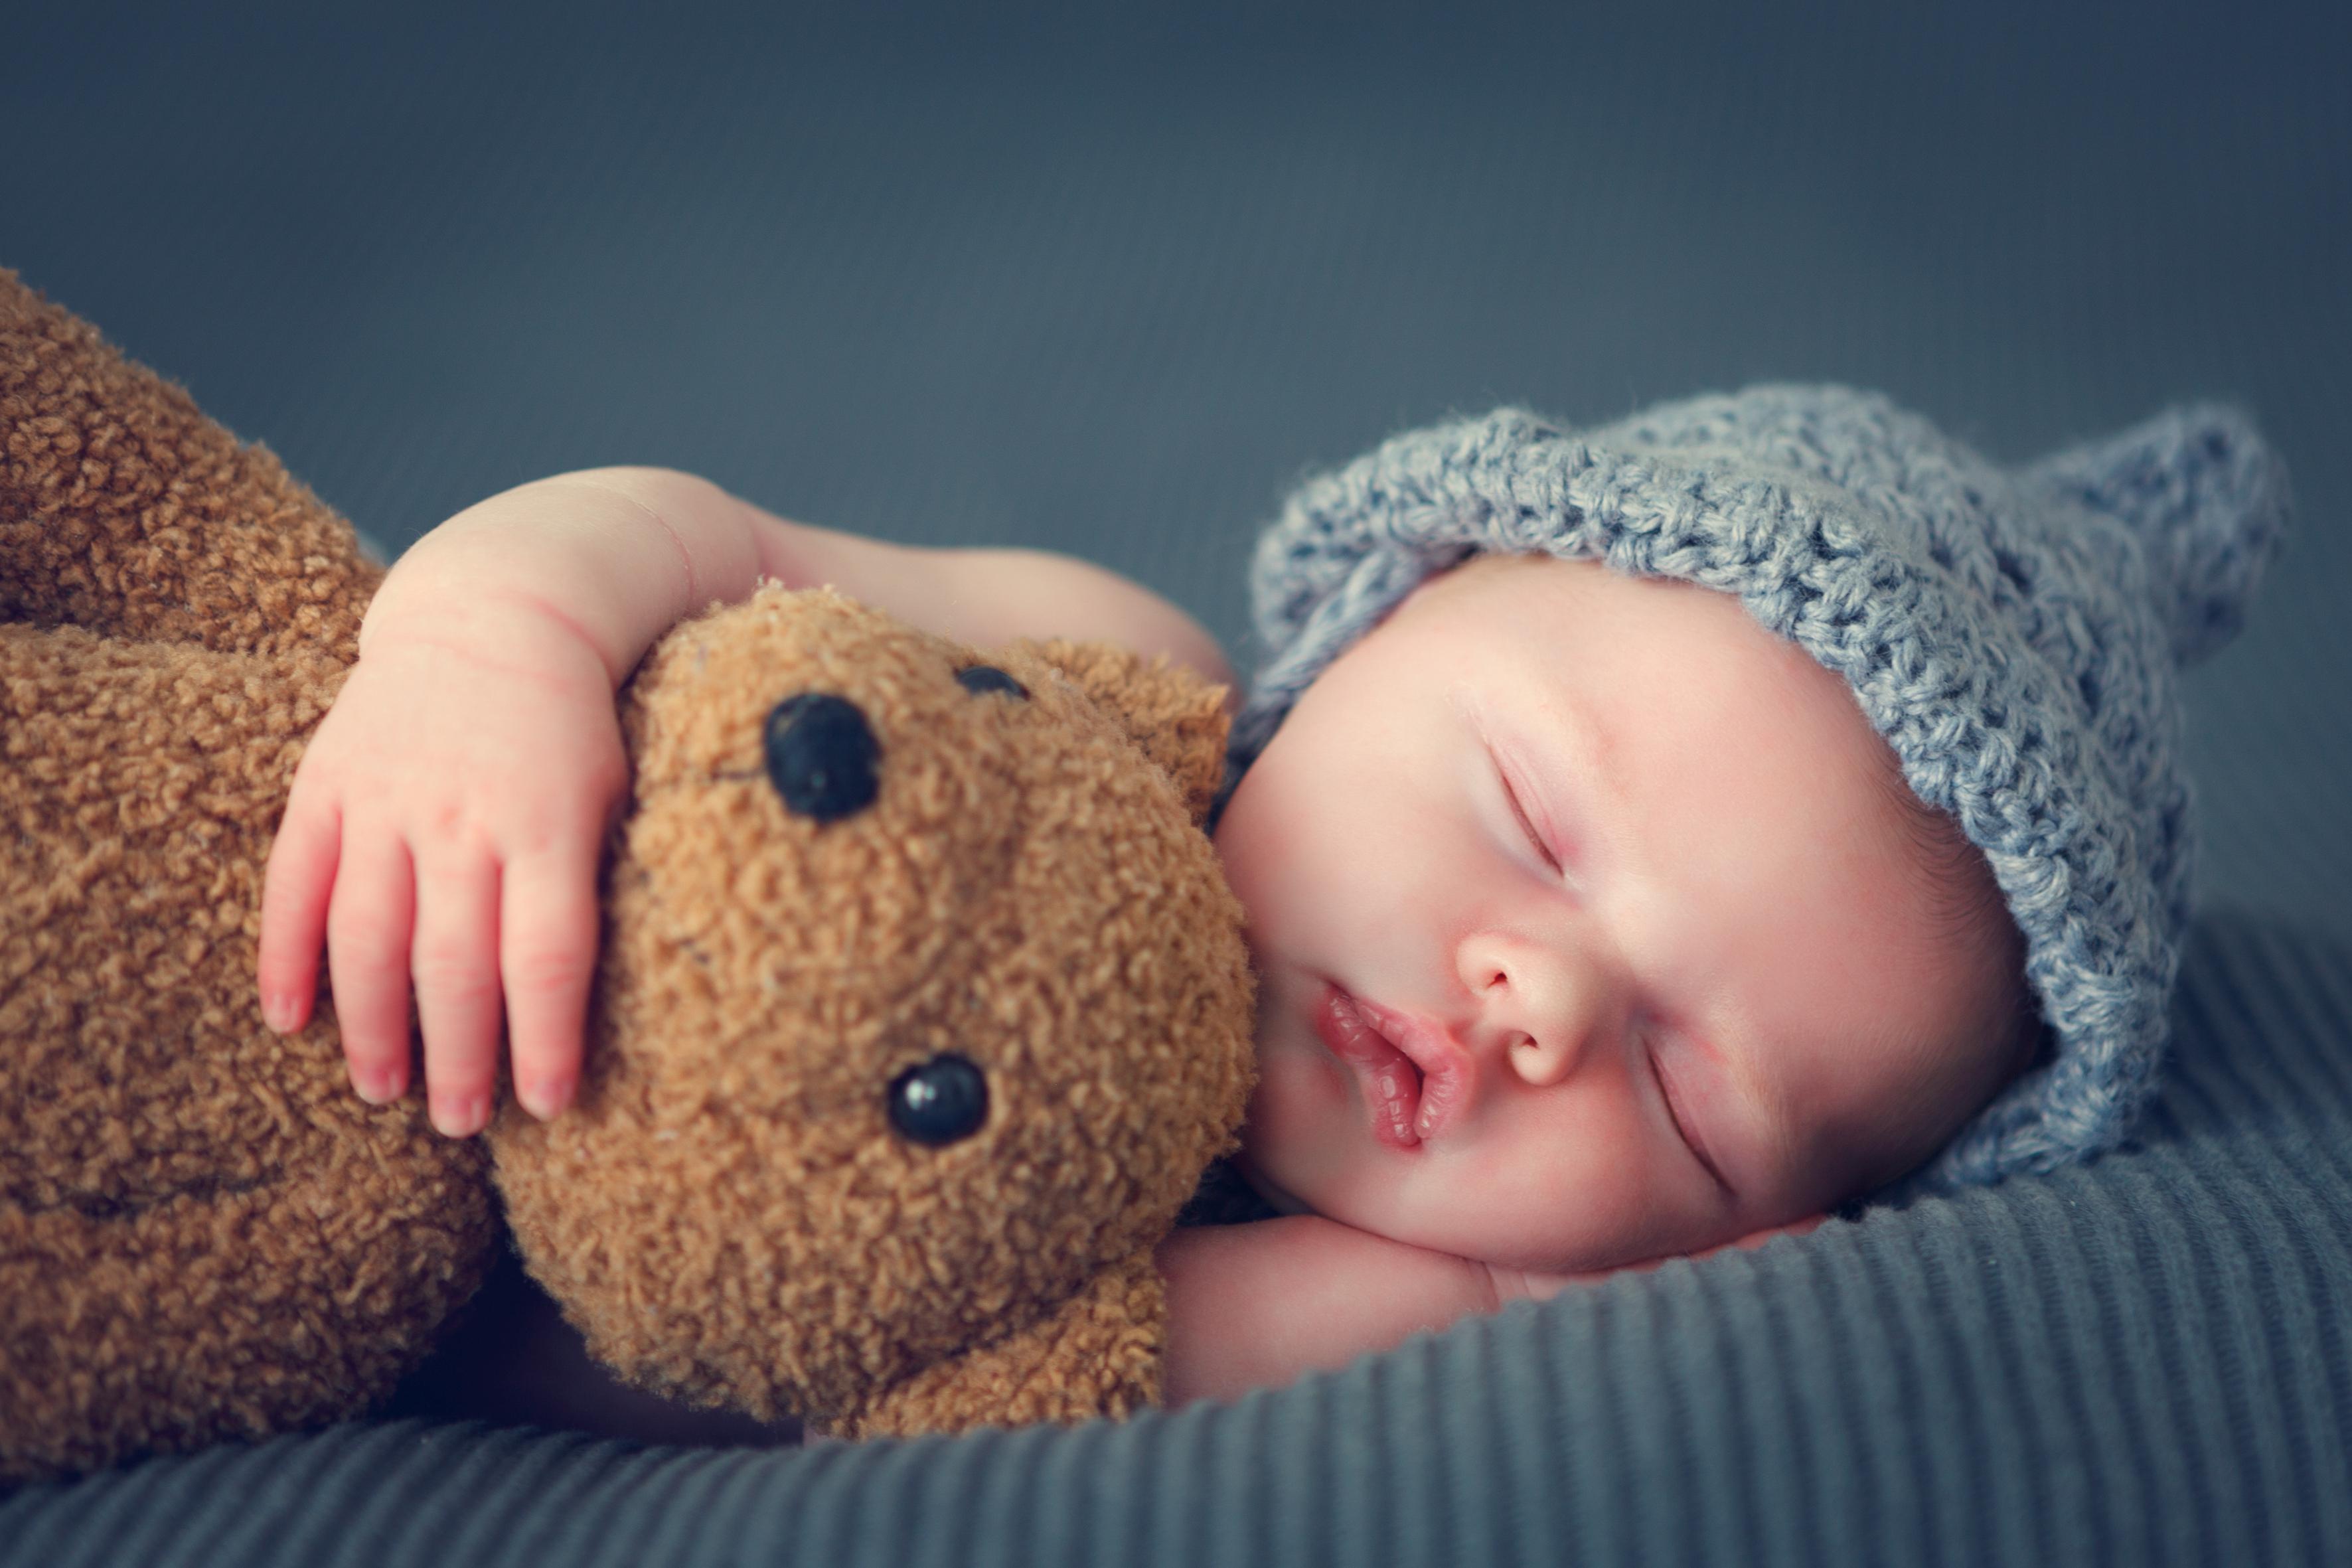 12 x babynamen voor reislustige ouders